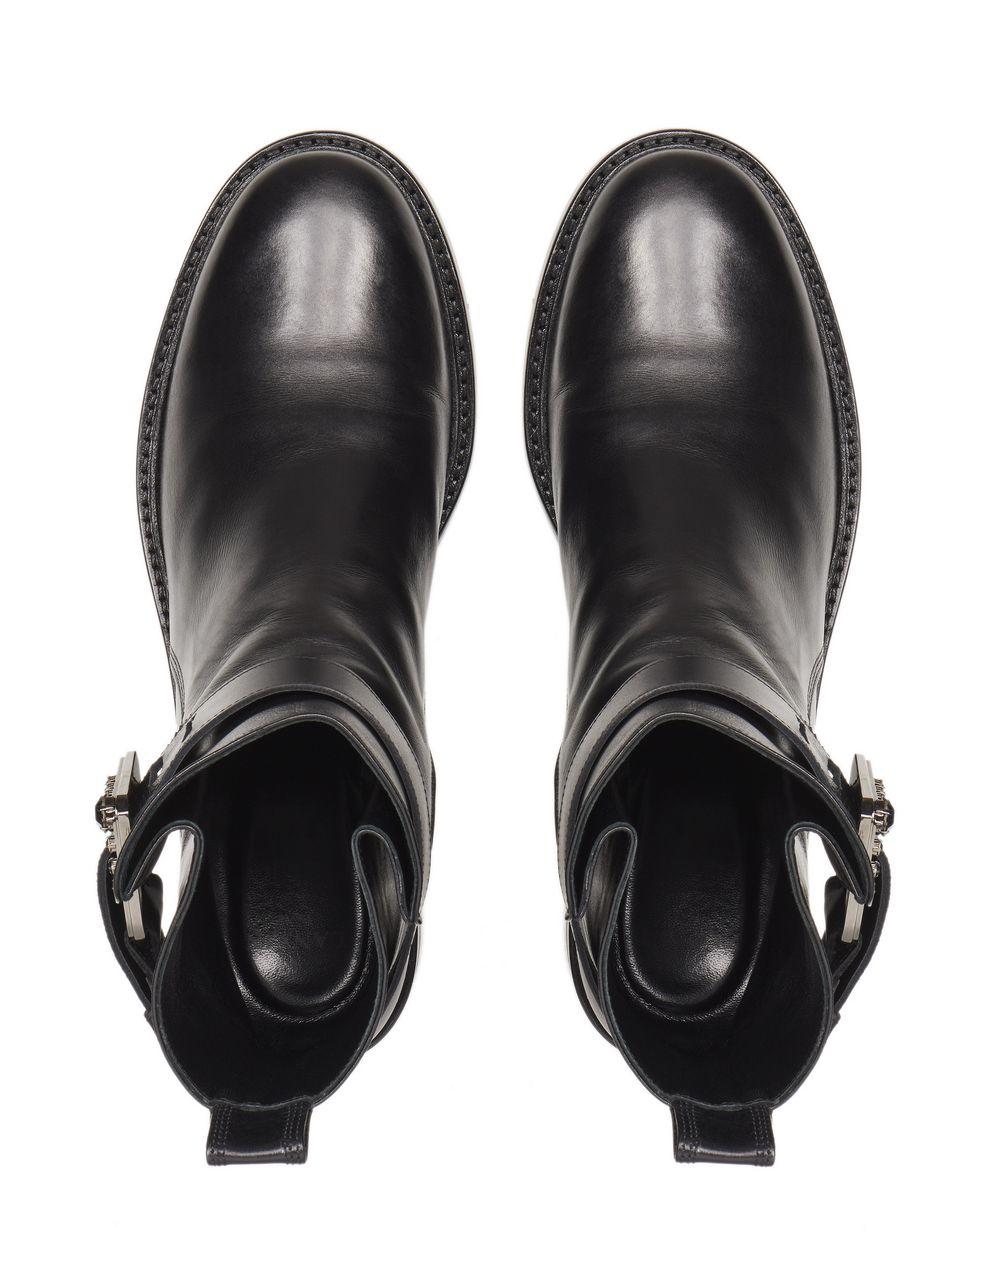 BLACK BUCKLED ANKLE BOOT - Lanvin